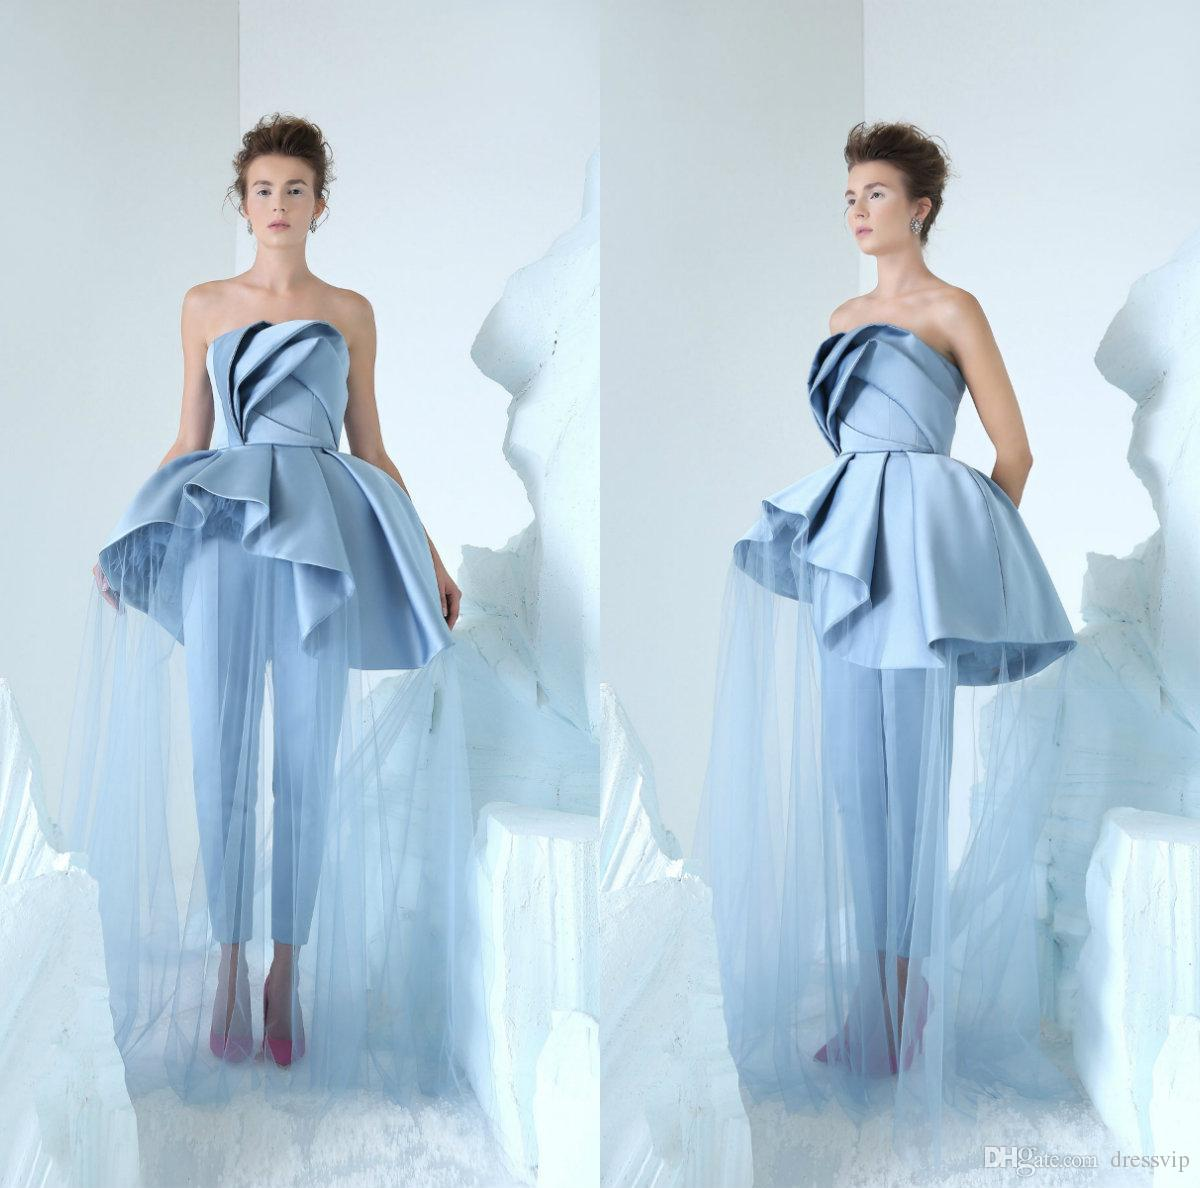 d7730a65805 2019 Azzi Osta Fashion Women Jumpsuit Prom Dresses Strapless Luxury Ruffles  Organza Satin Custom Made Evening Dress Party Wear Girls Gowns Long White  ...